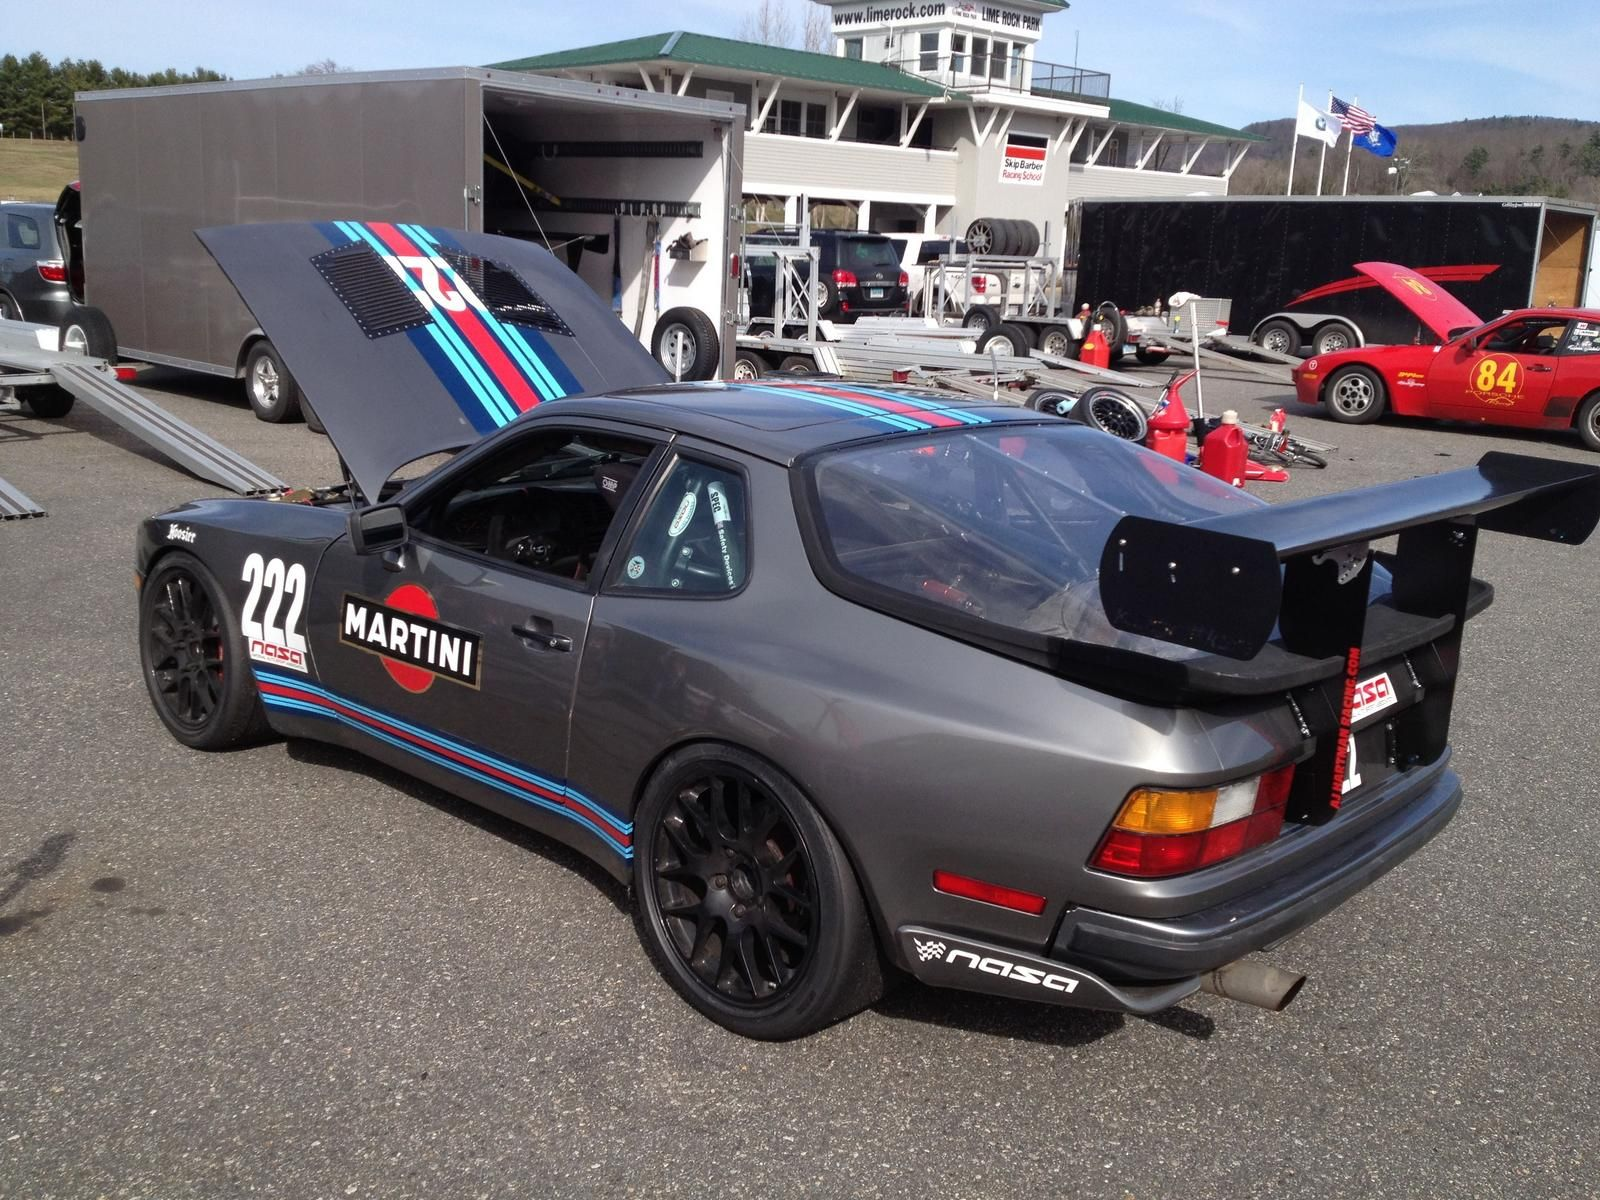 87 Porsche 944 Turbo Track Car - Rennlist Discussion Forums | 944 ...